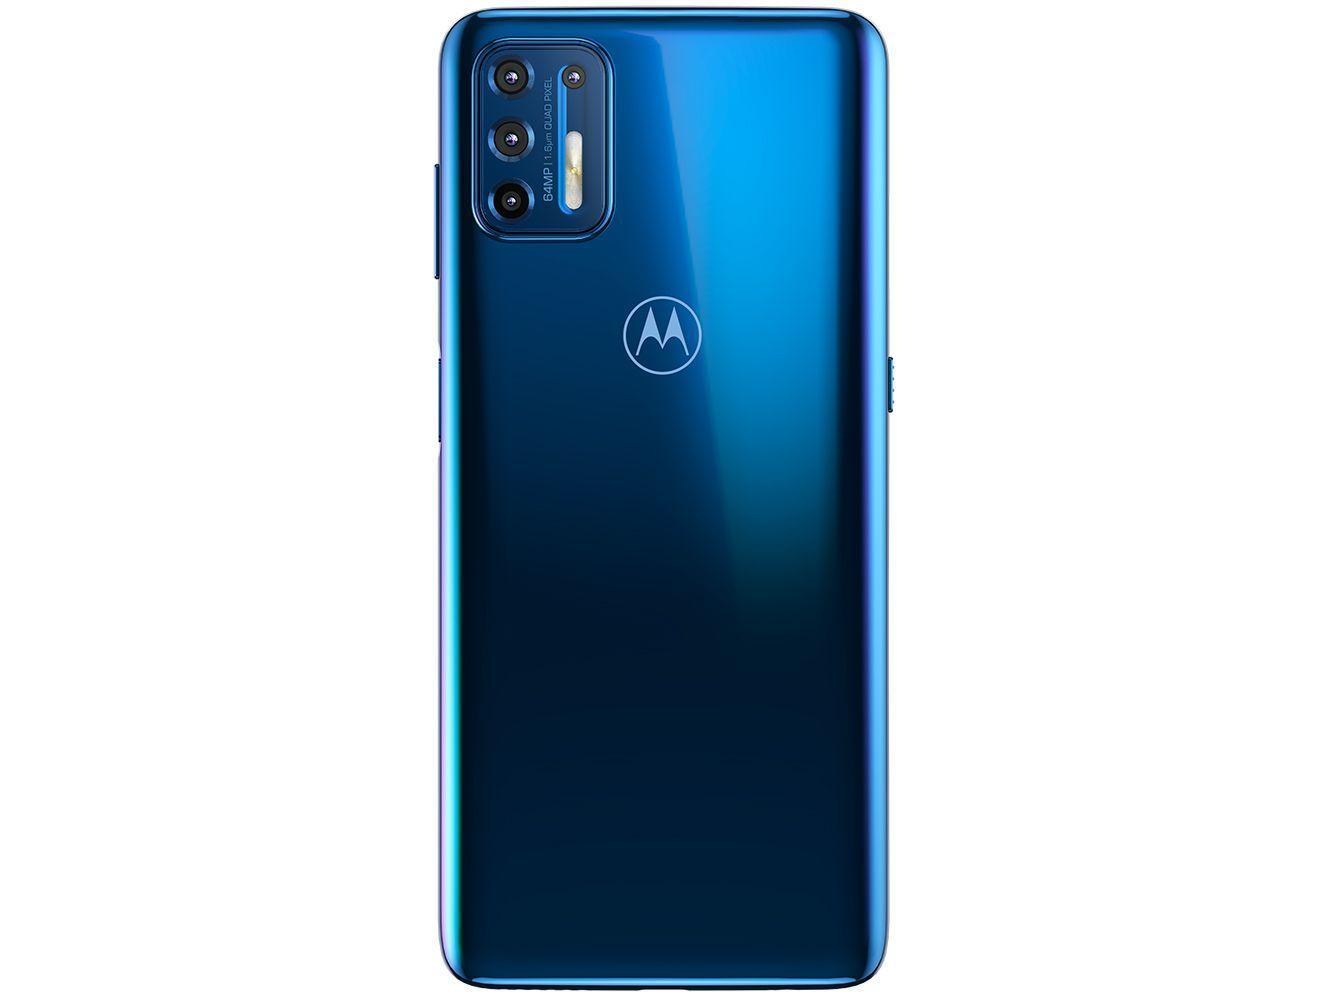 CELULAR SMARTPHONE MOTOROLA MOTO G9 PLUS AZUL ÍNDIGO 128GB, 4GB RAM, TELA DE 6.8?, OCTA-CORE